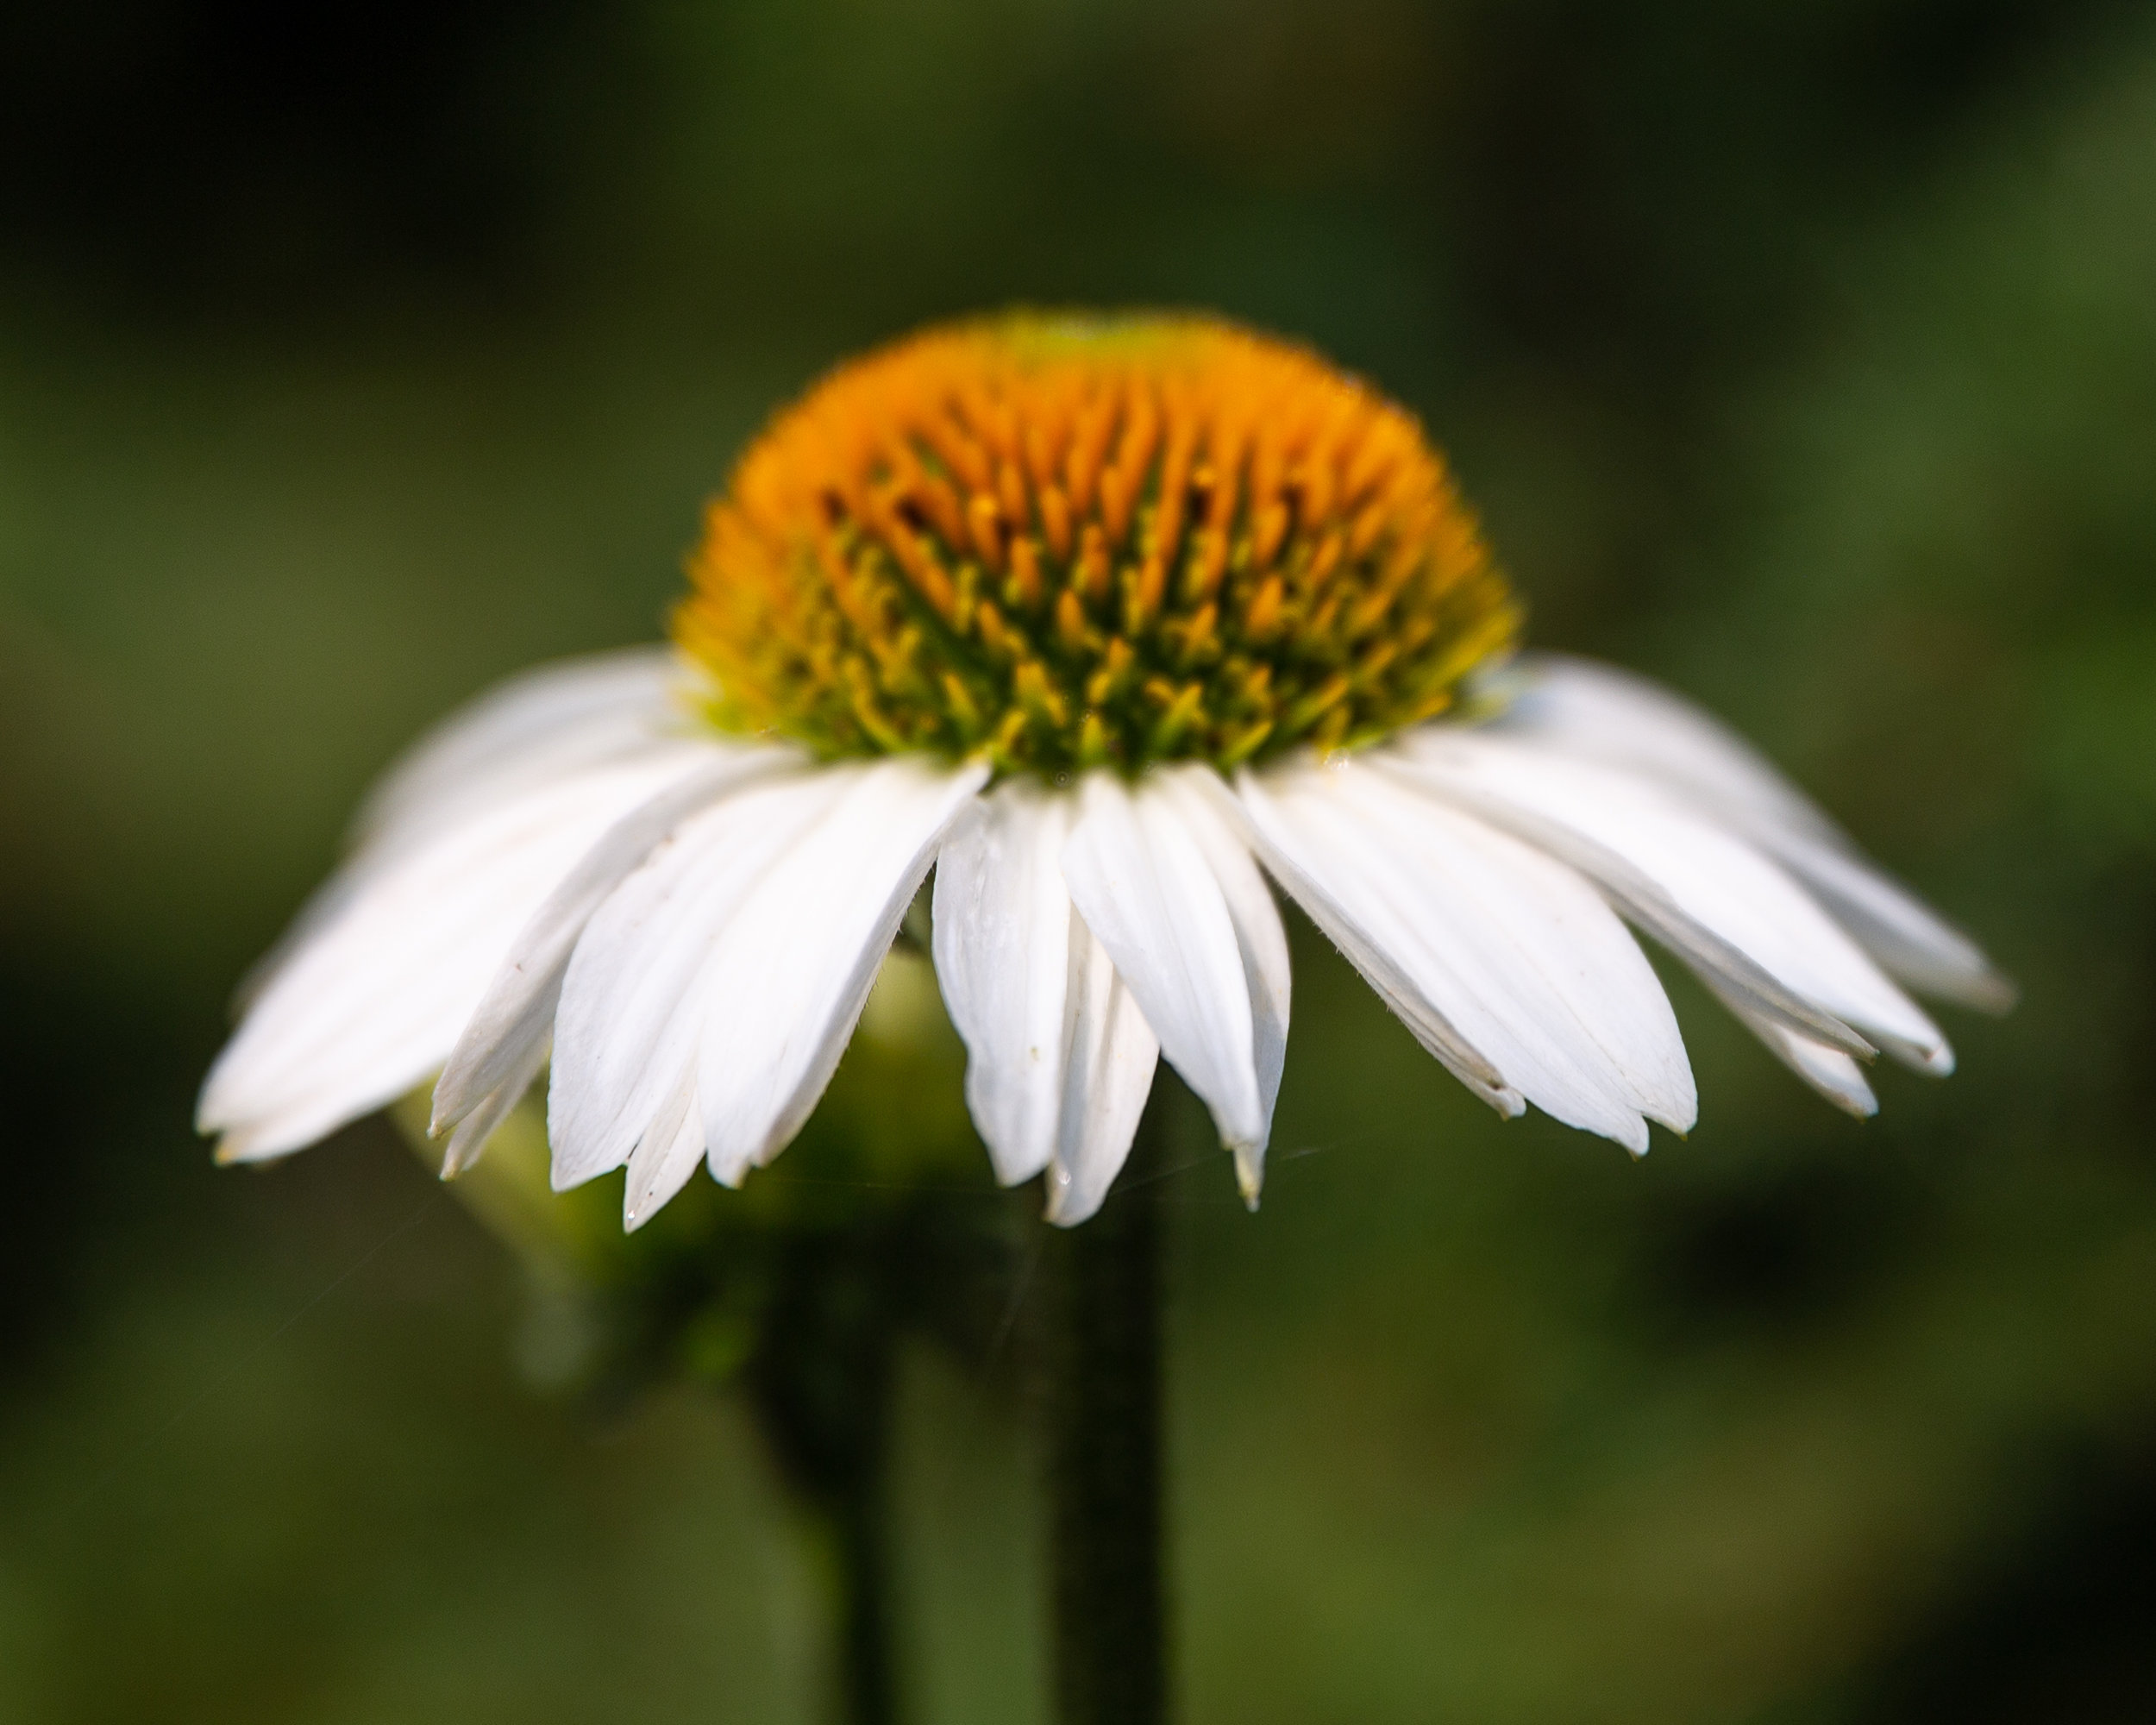 14 august 2018 flowers in my garden 5 stars (1 of 24).jpg